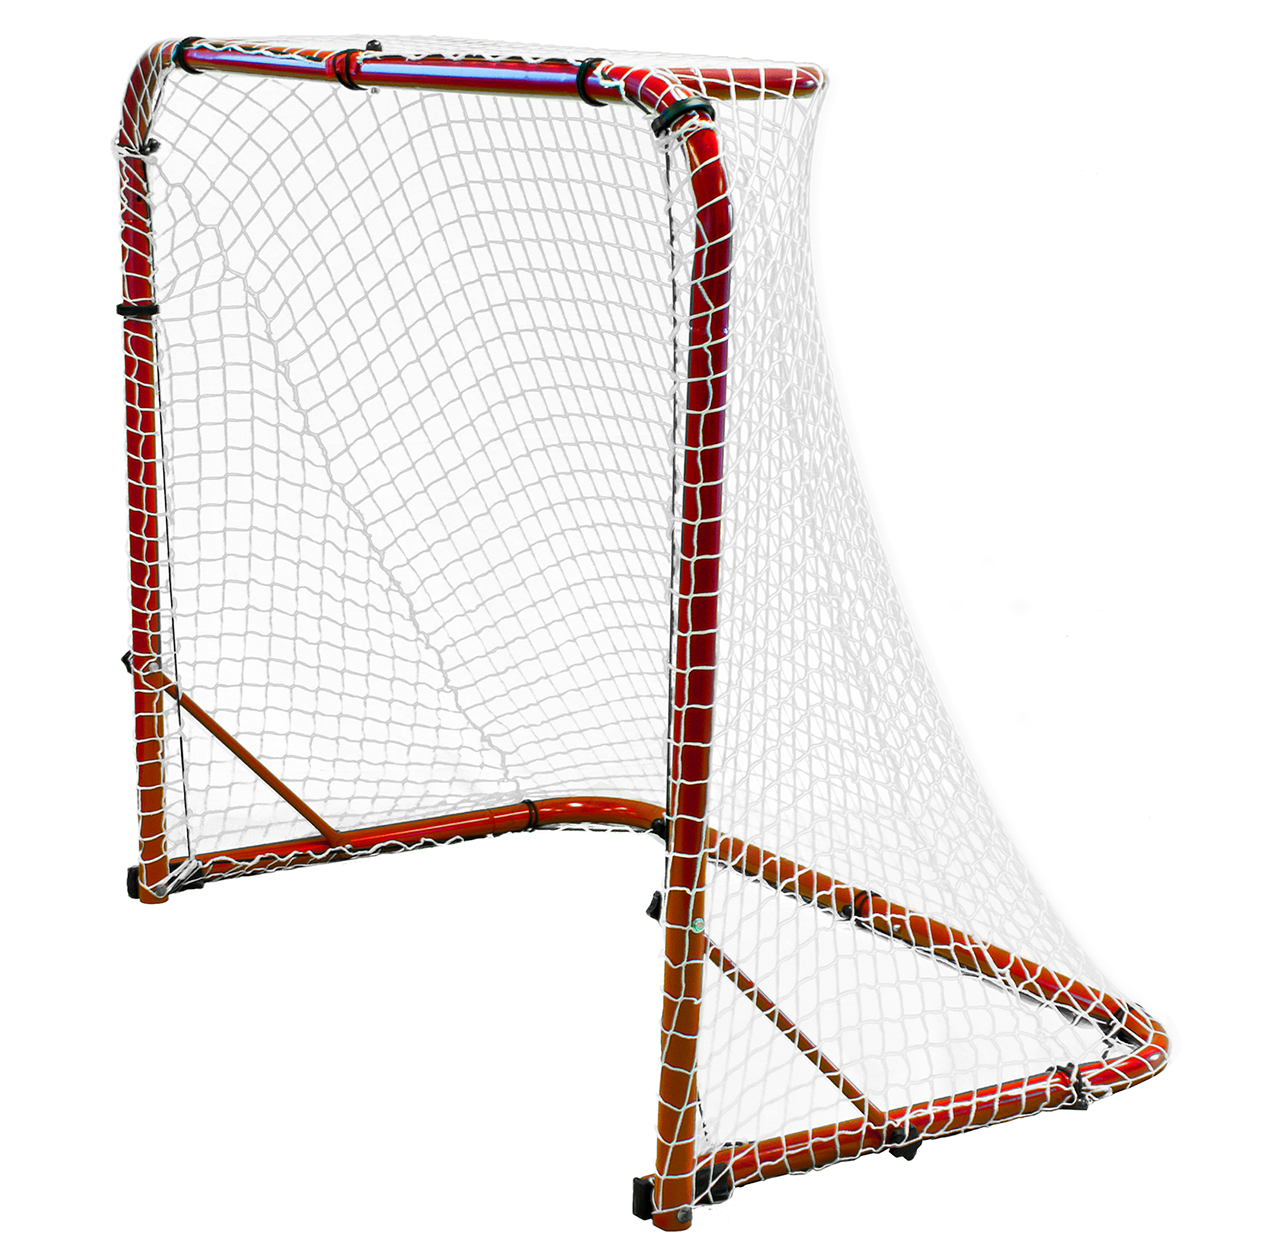 Durable 54 inch Folding 18 gauge Steel Street Hockey Goal